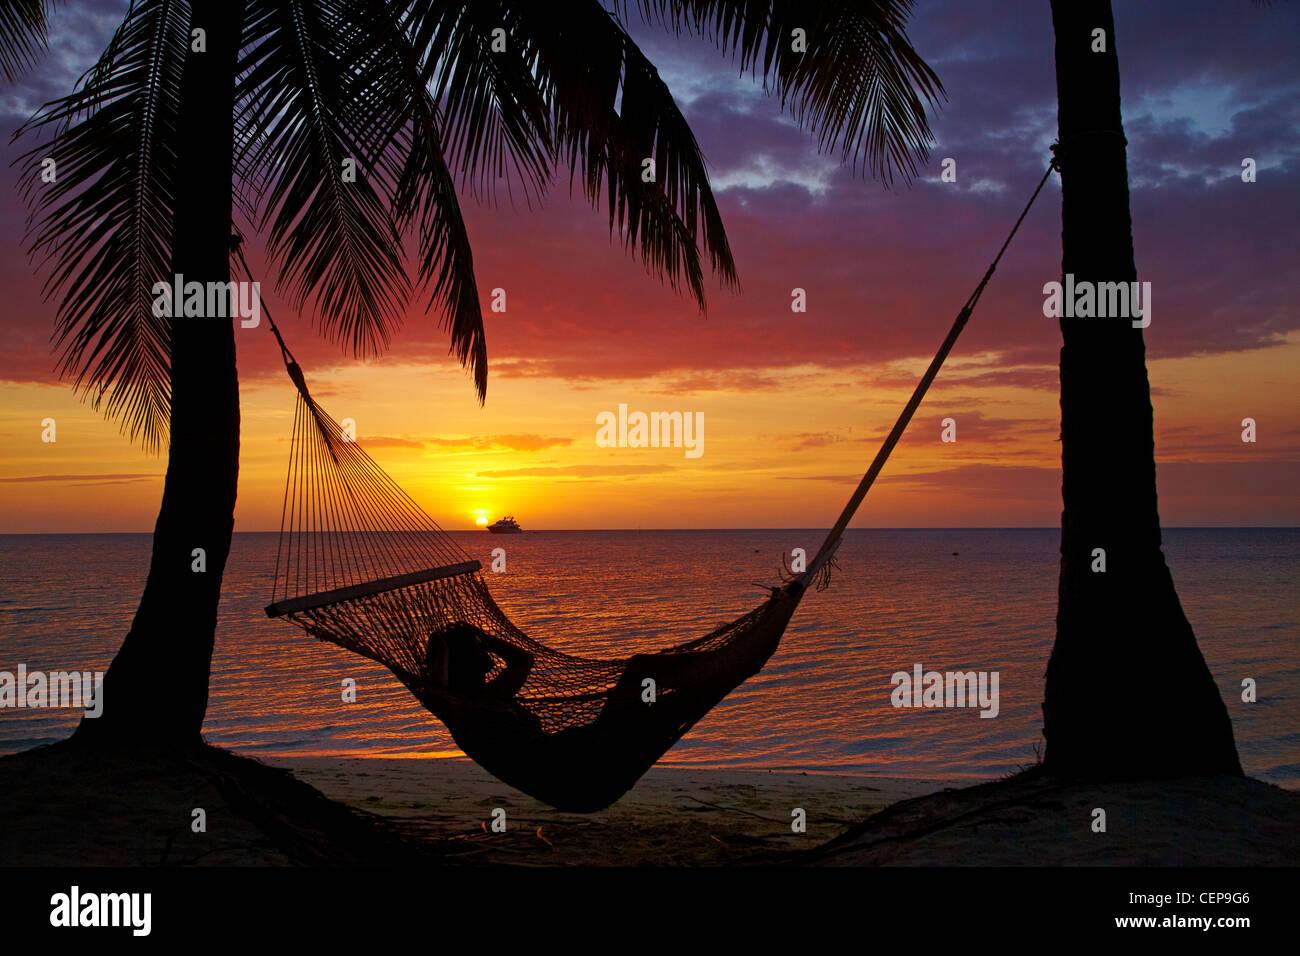 Hammock and sunset, Plantation Island Resort, Malolo Lailai Island, Mamanuca Islands, Fiji, South Pacific - Stock Image